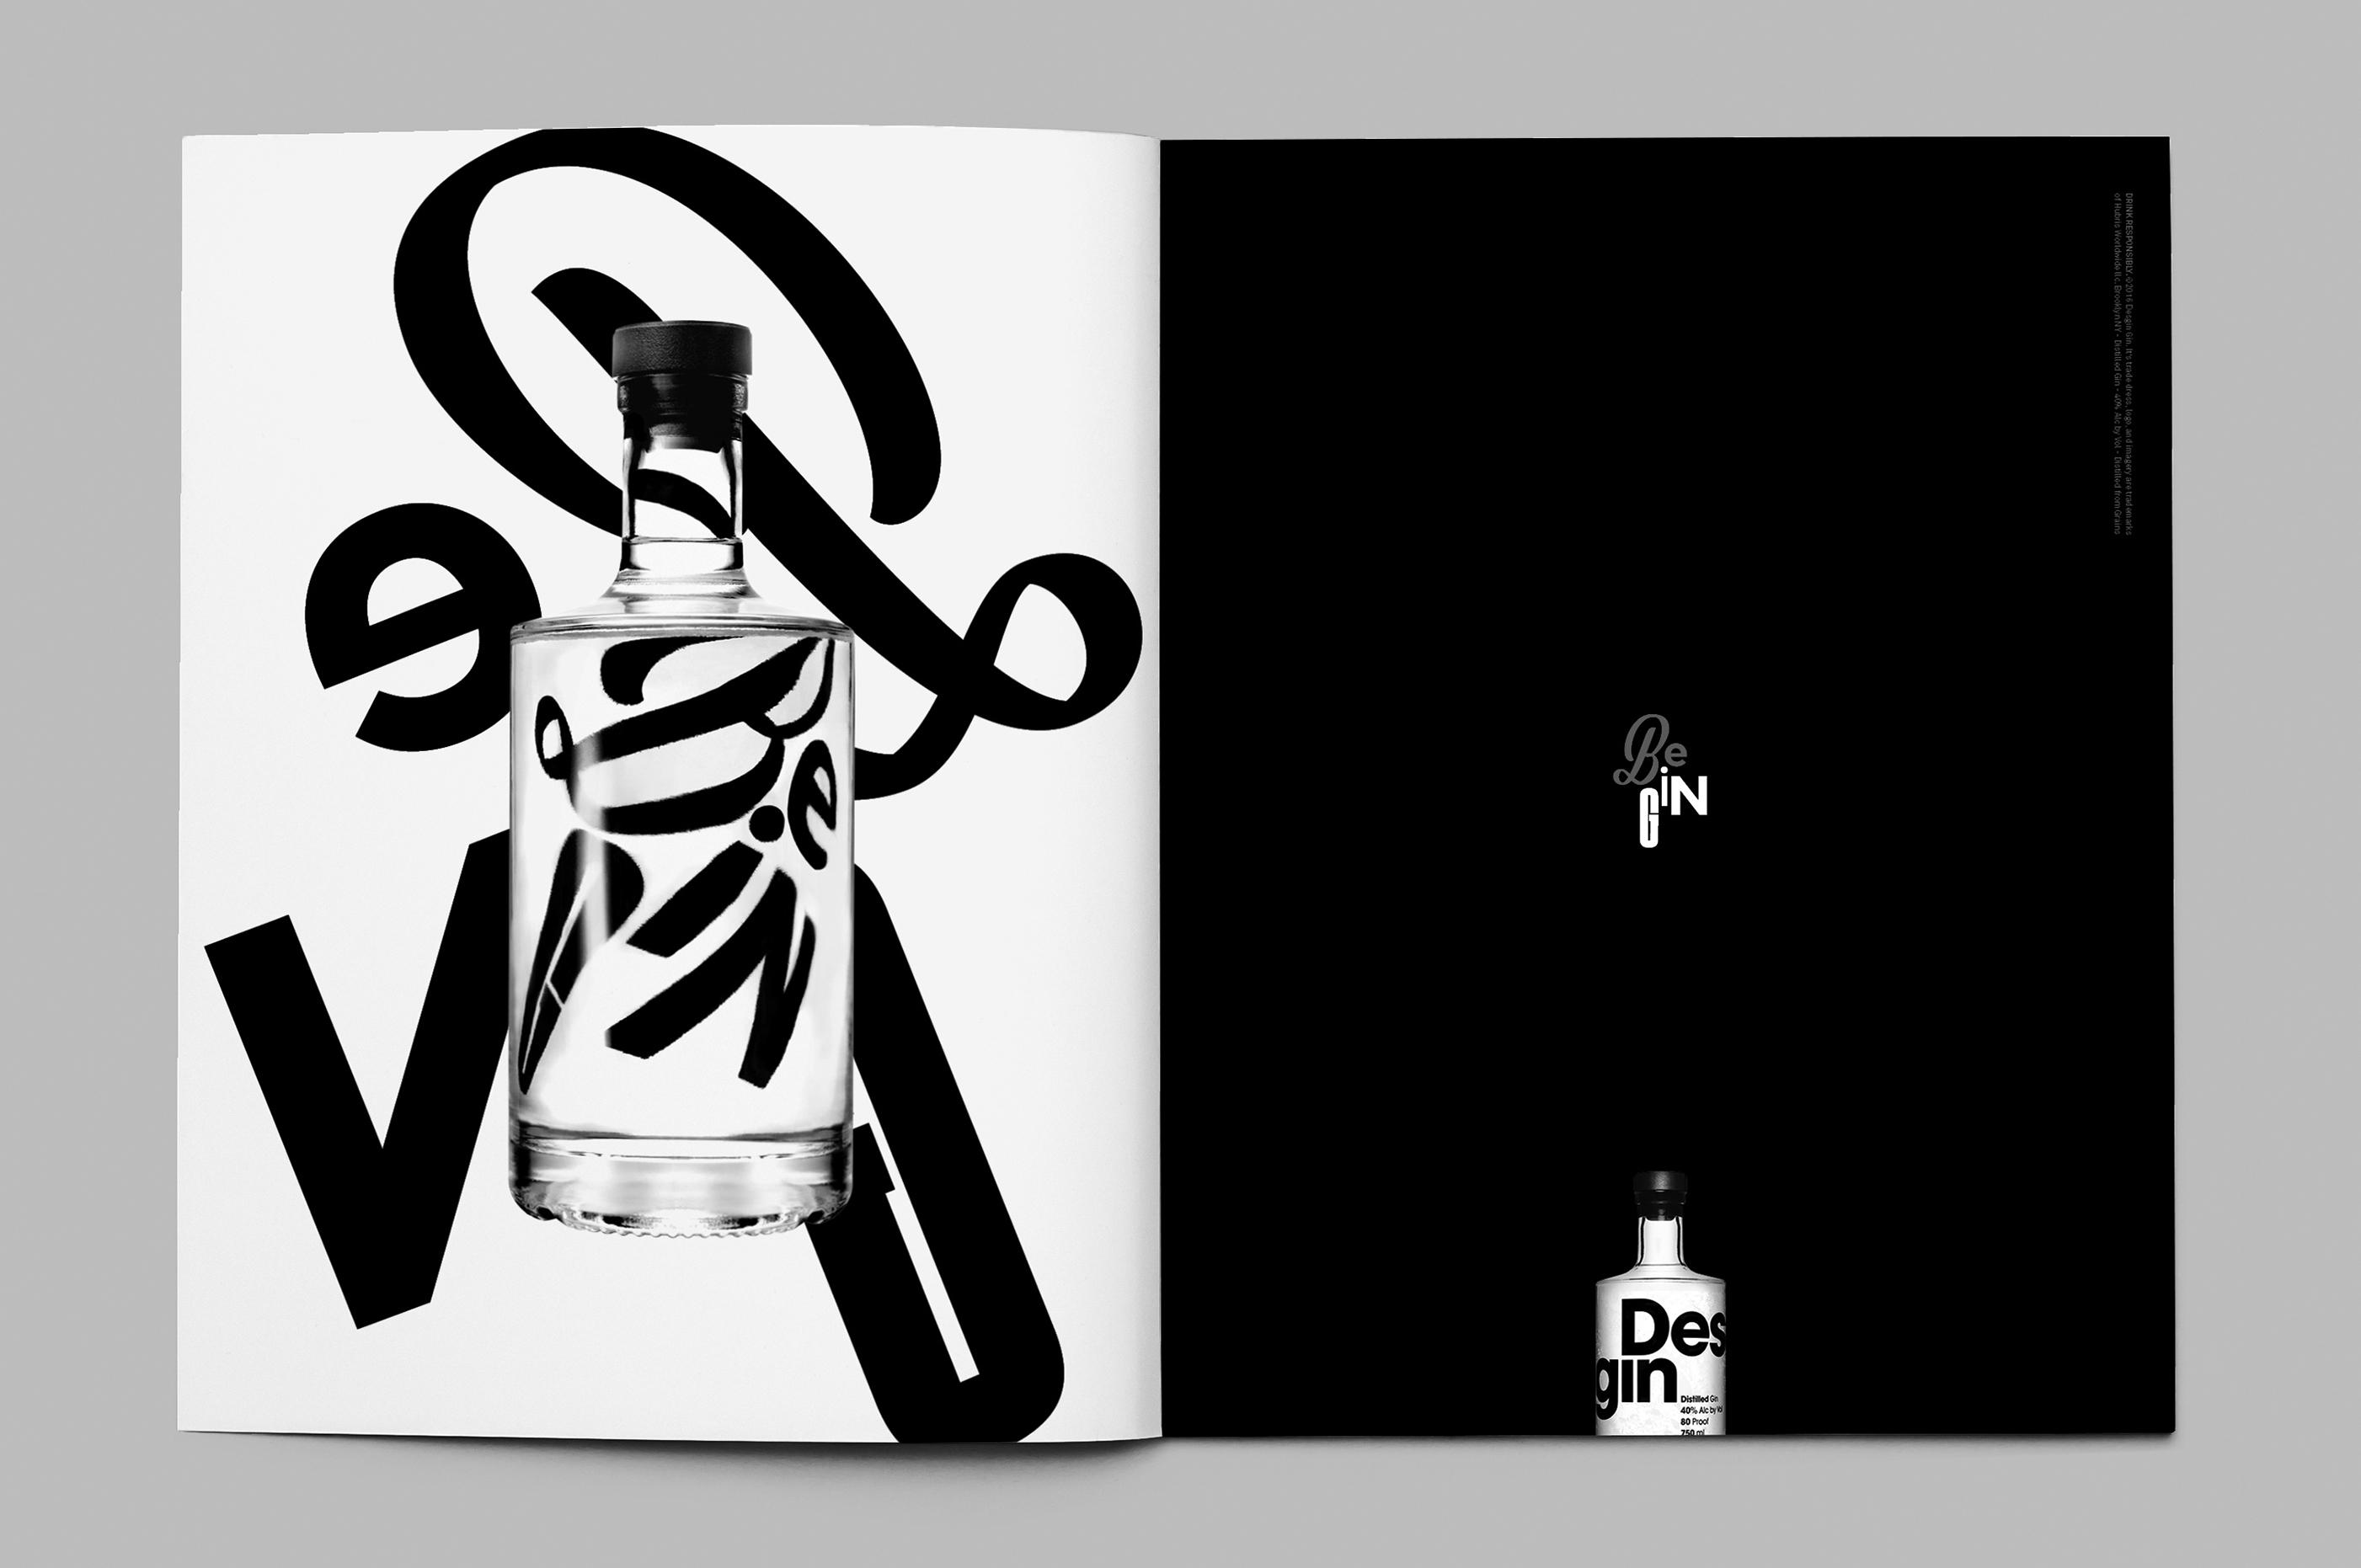 Desgin magazine 15